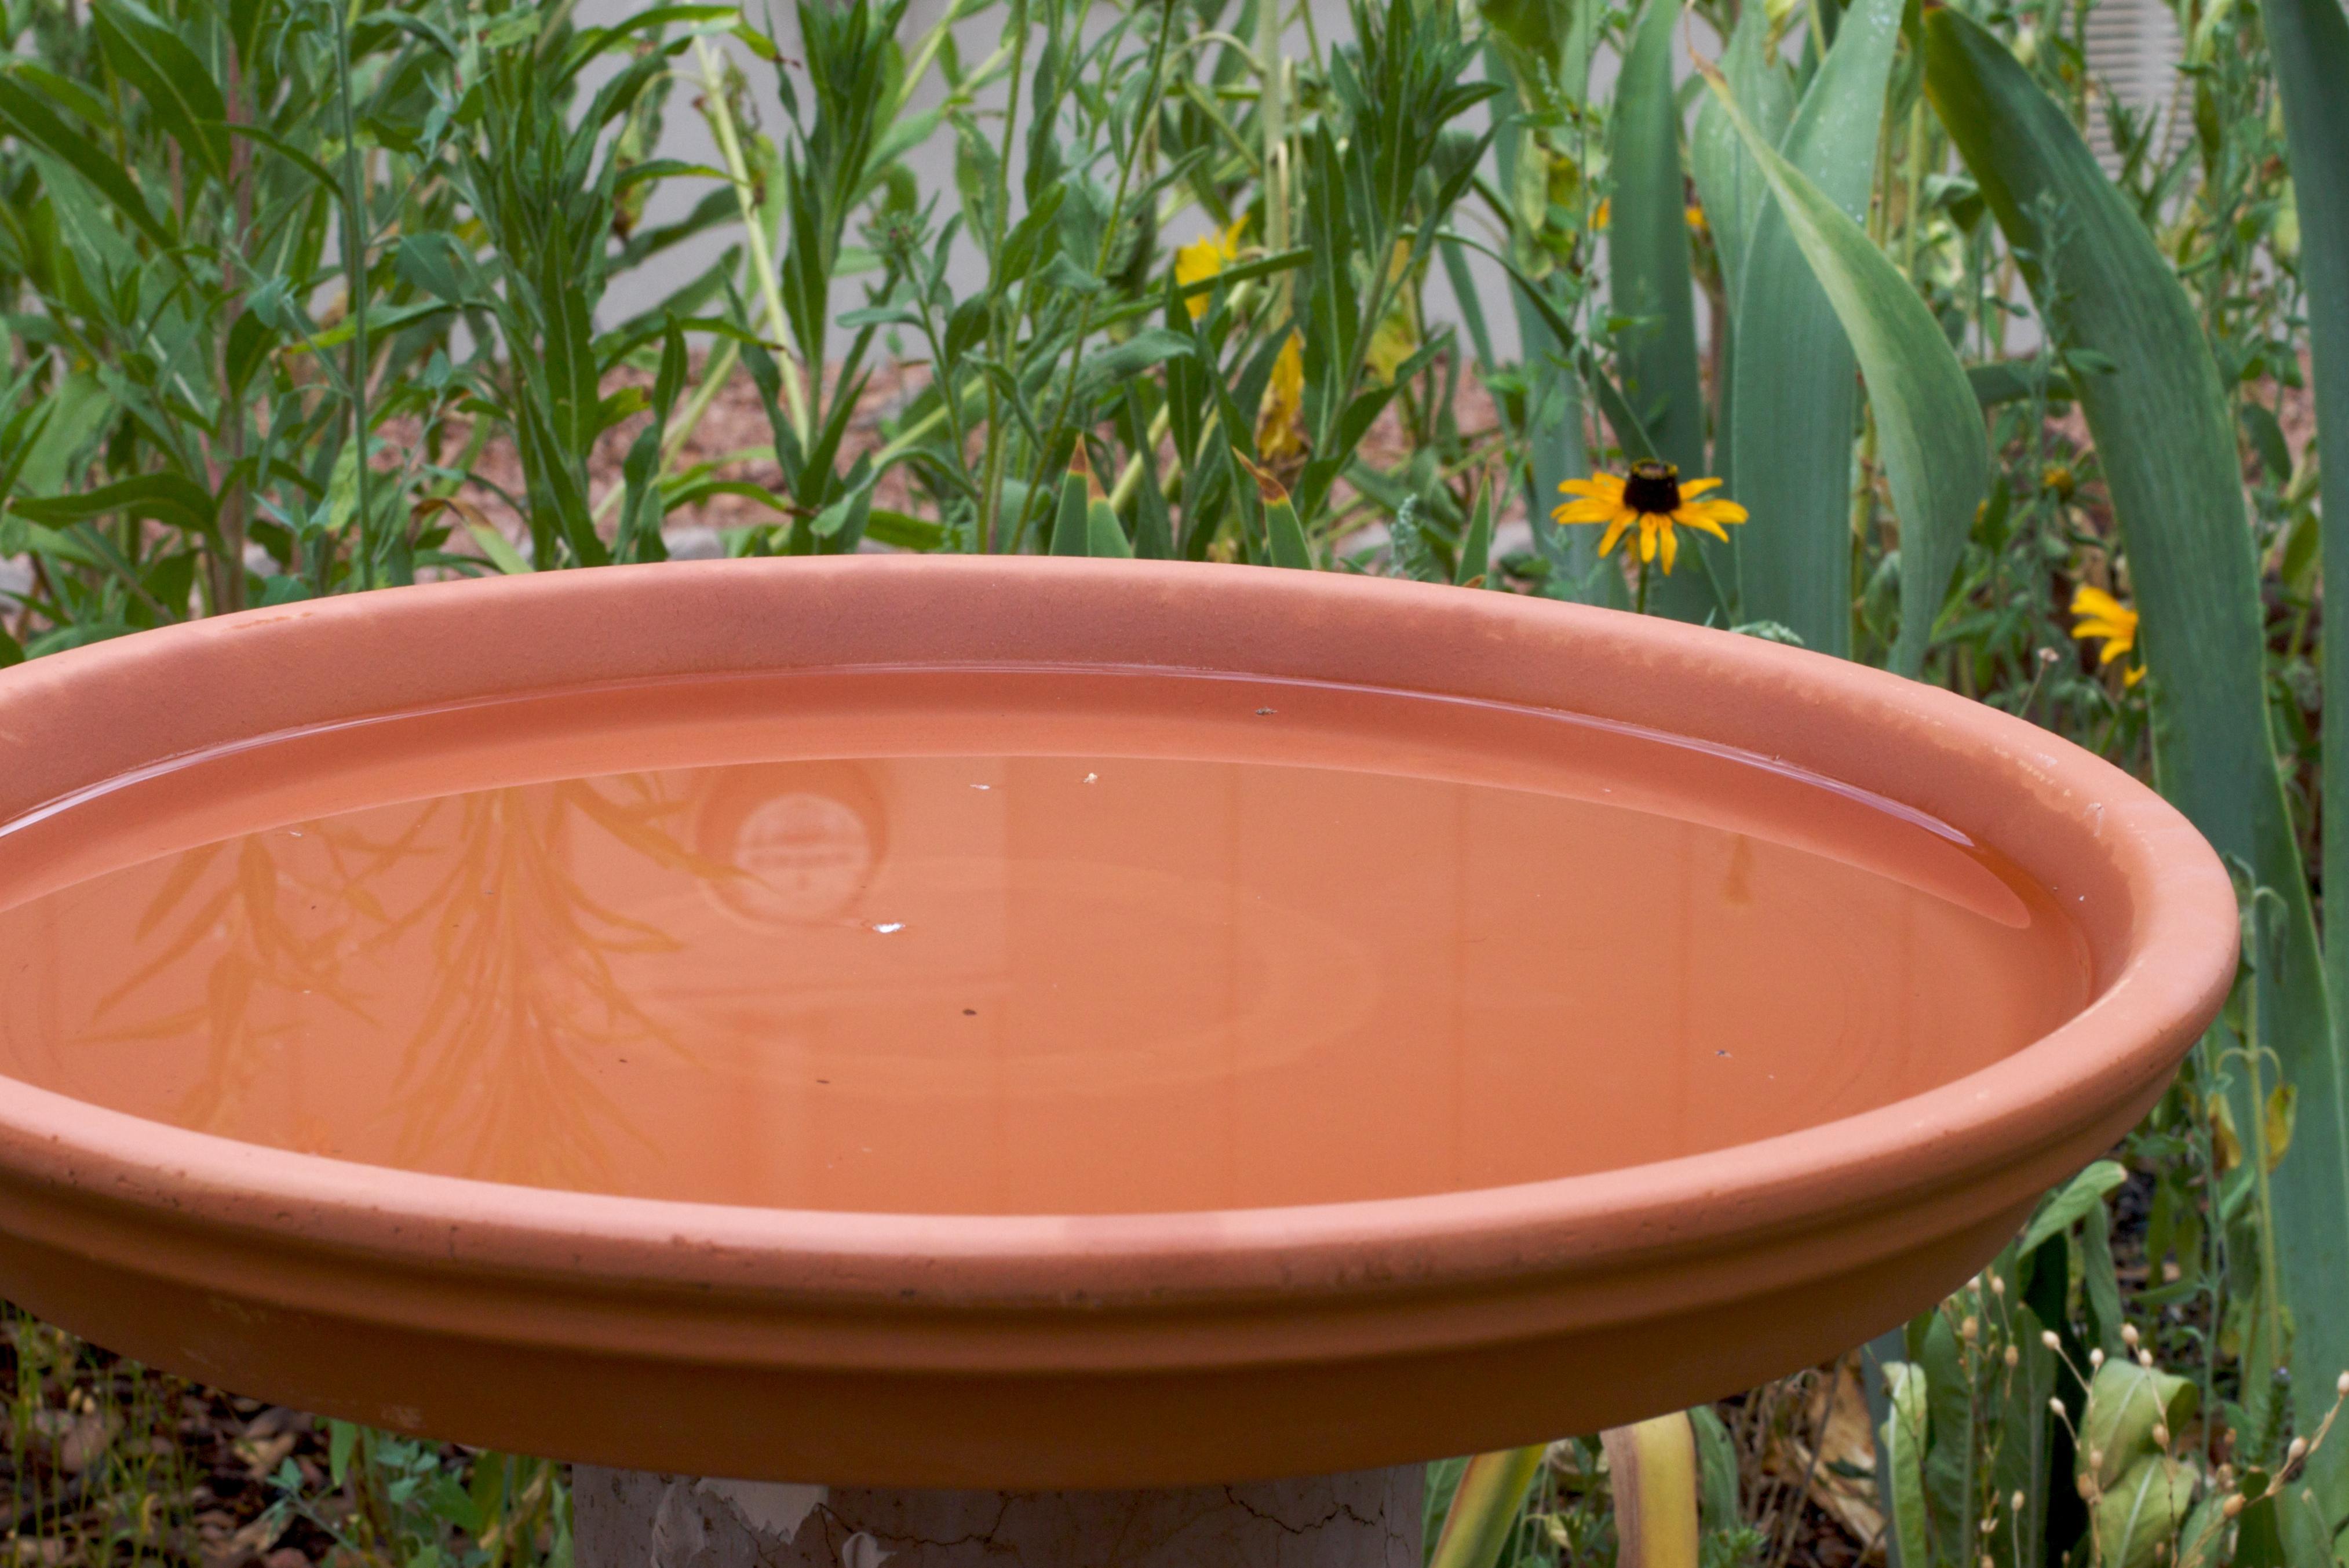 Free Images Flower Green Produce Backyard Garden